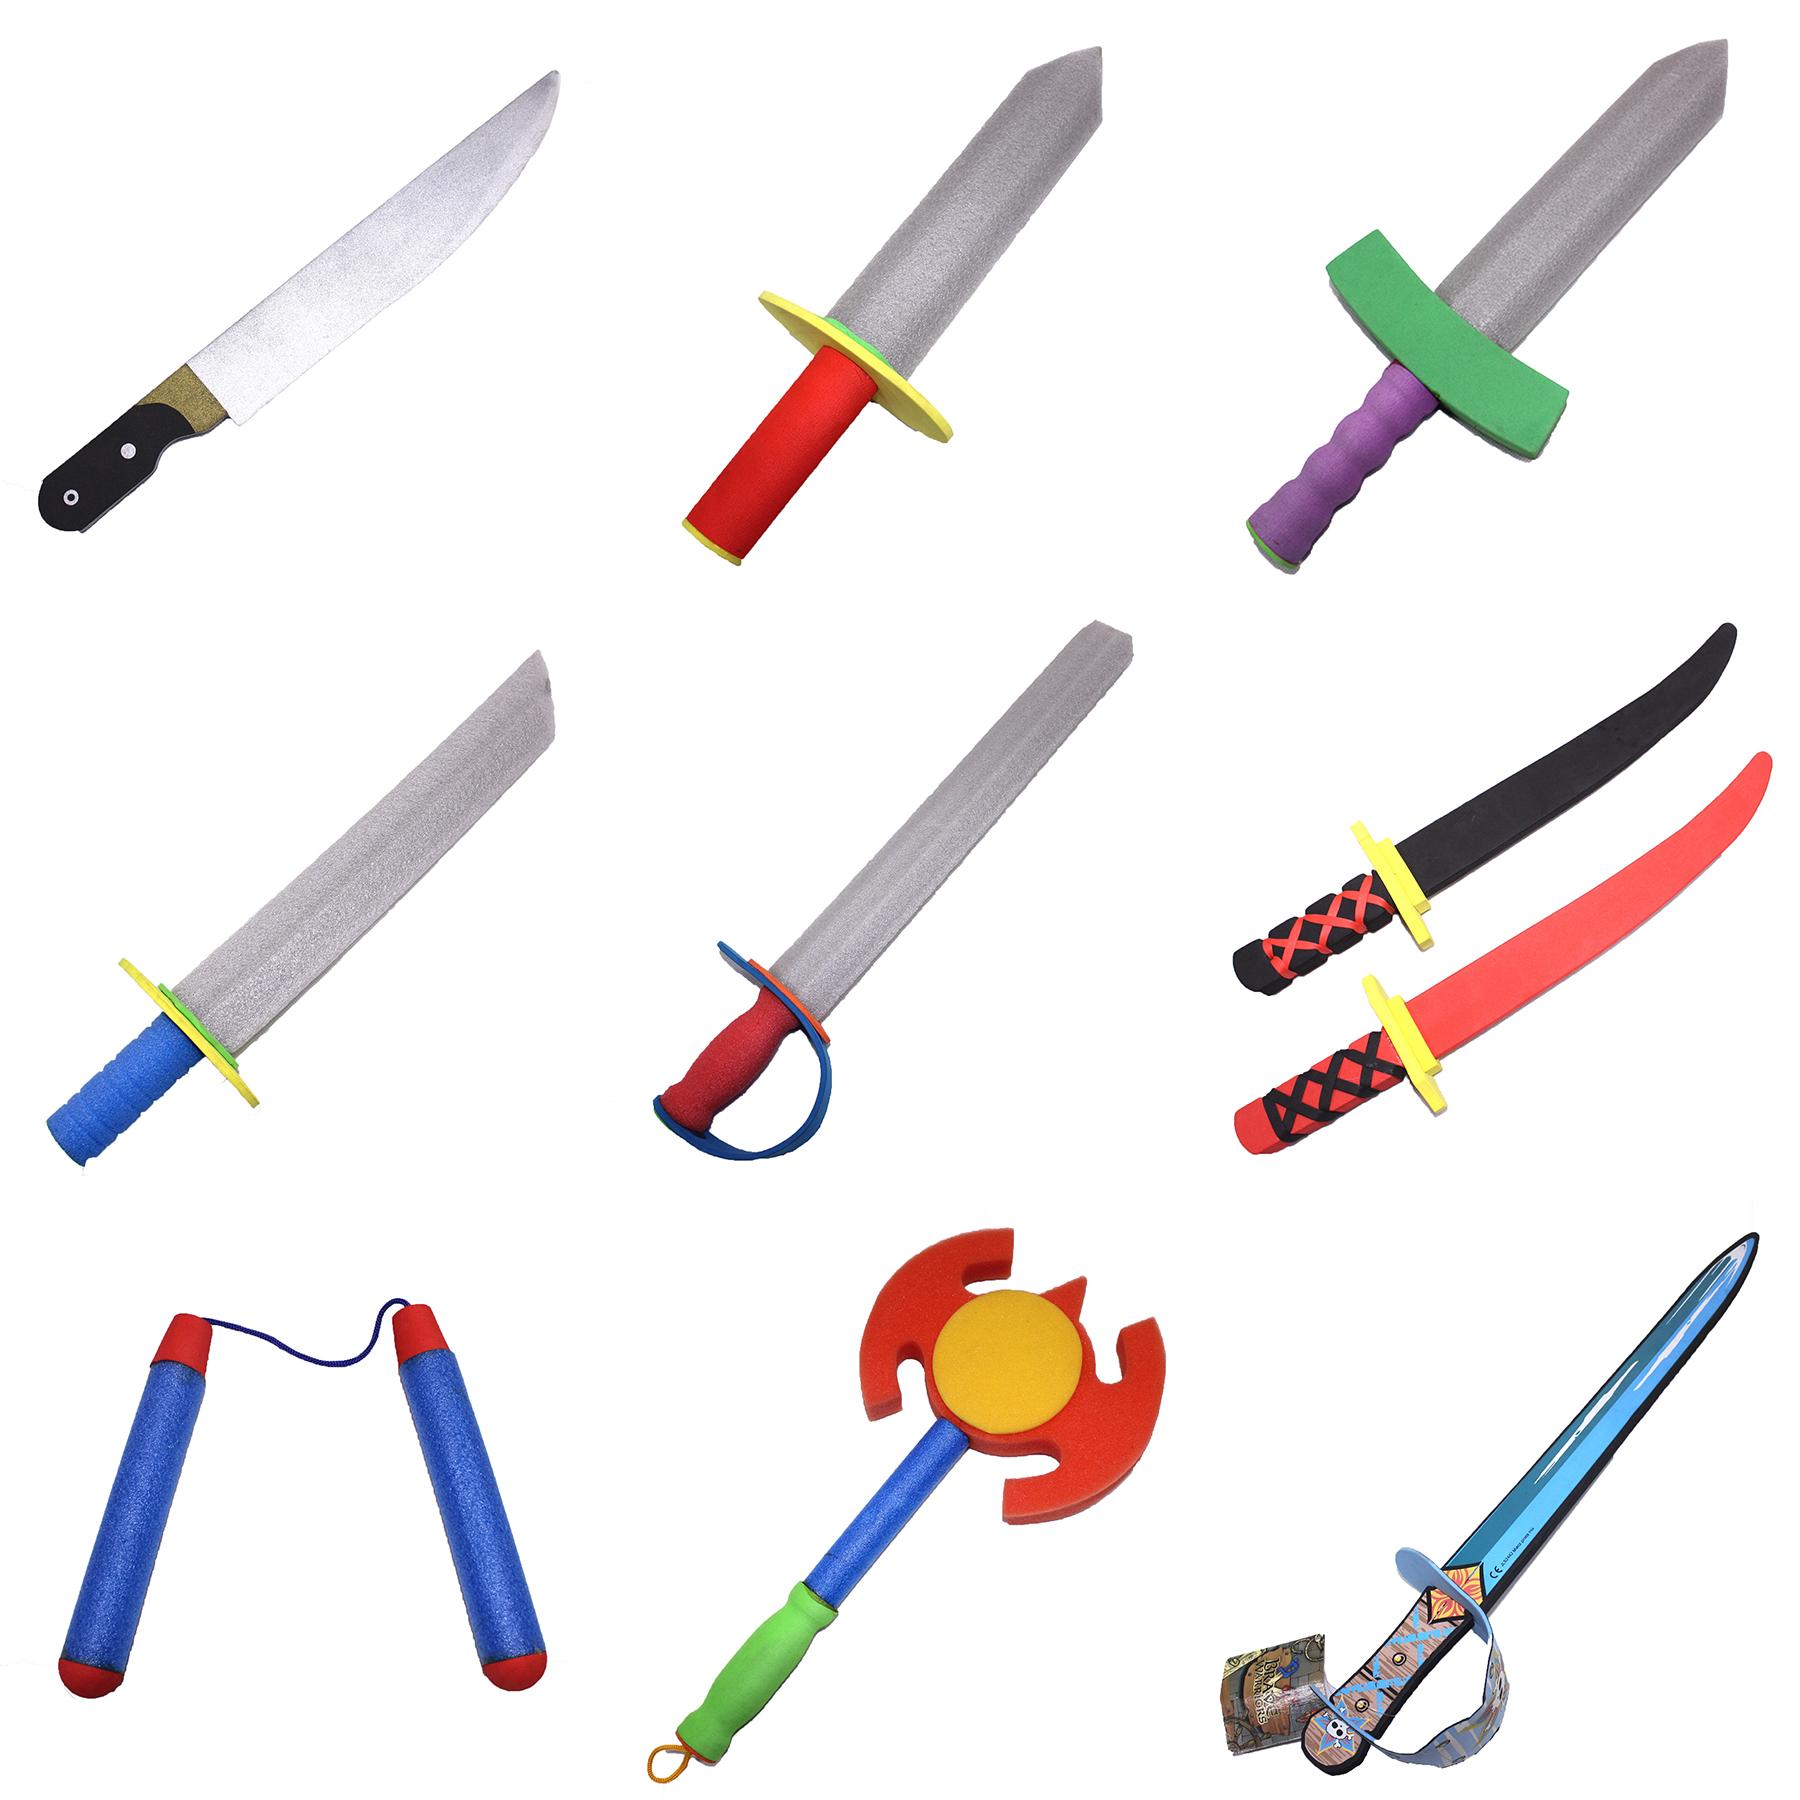 Costume Accessories Kids Toy Scimitar Eva Foam Pirate Sword